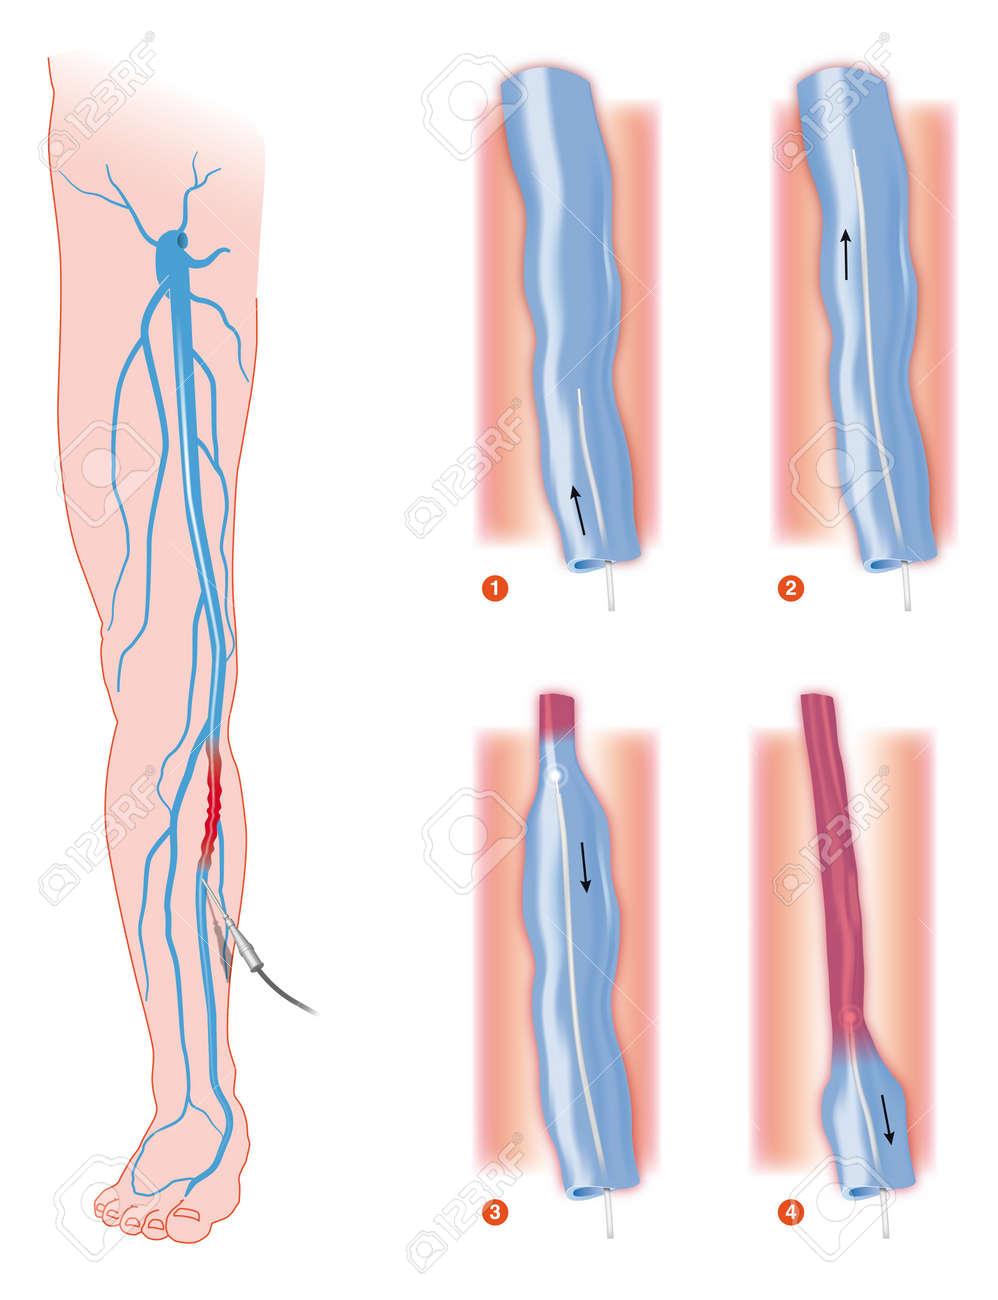 endovenous laser treatment varicose vein ablation Stock Photo - 16455963